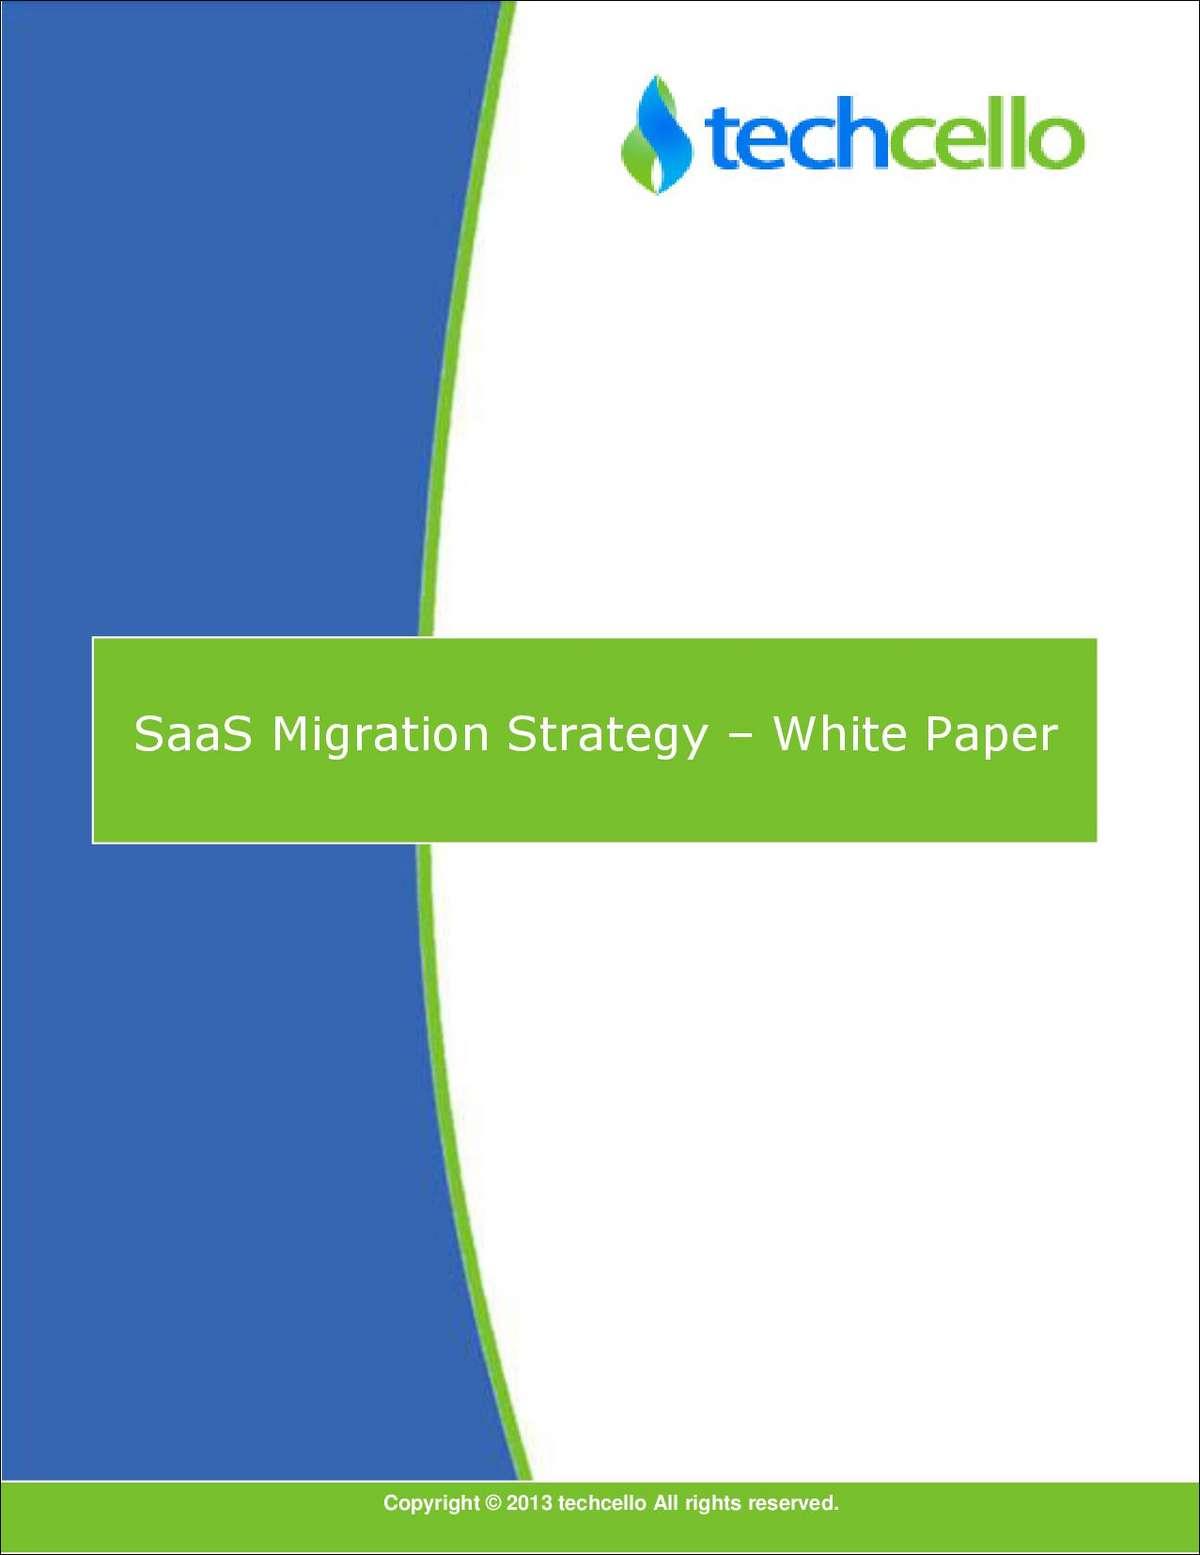 SaaS Migration Strategy